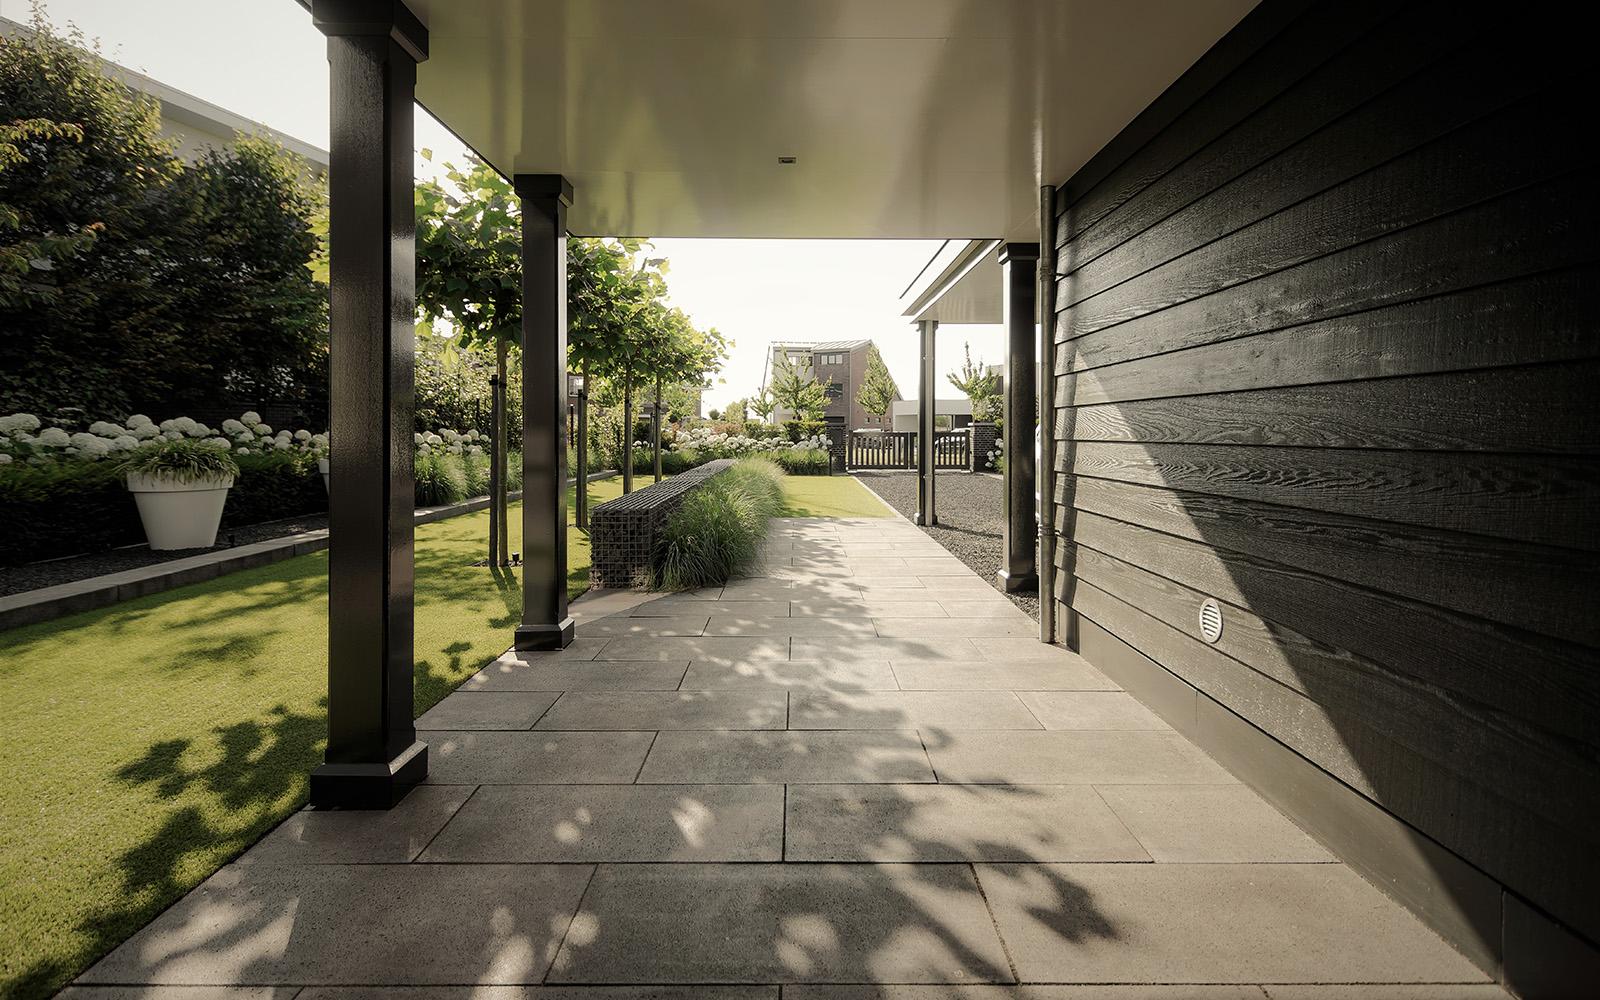 villatuin, Buytengewoon Tuinontwerp, The Art of Living